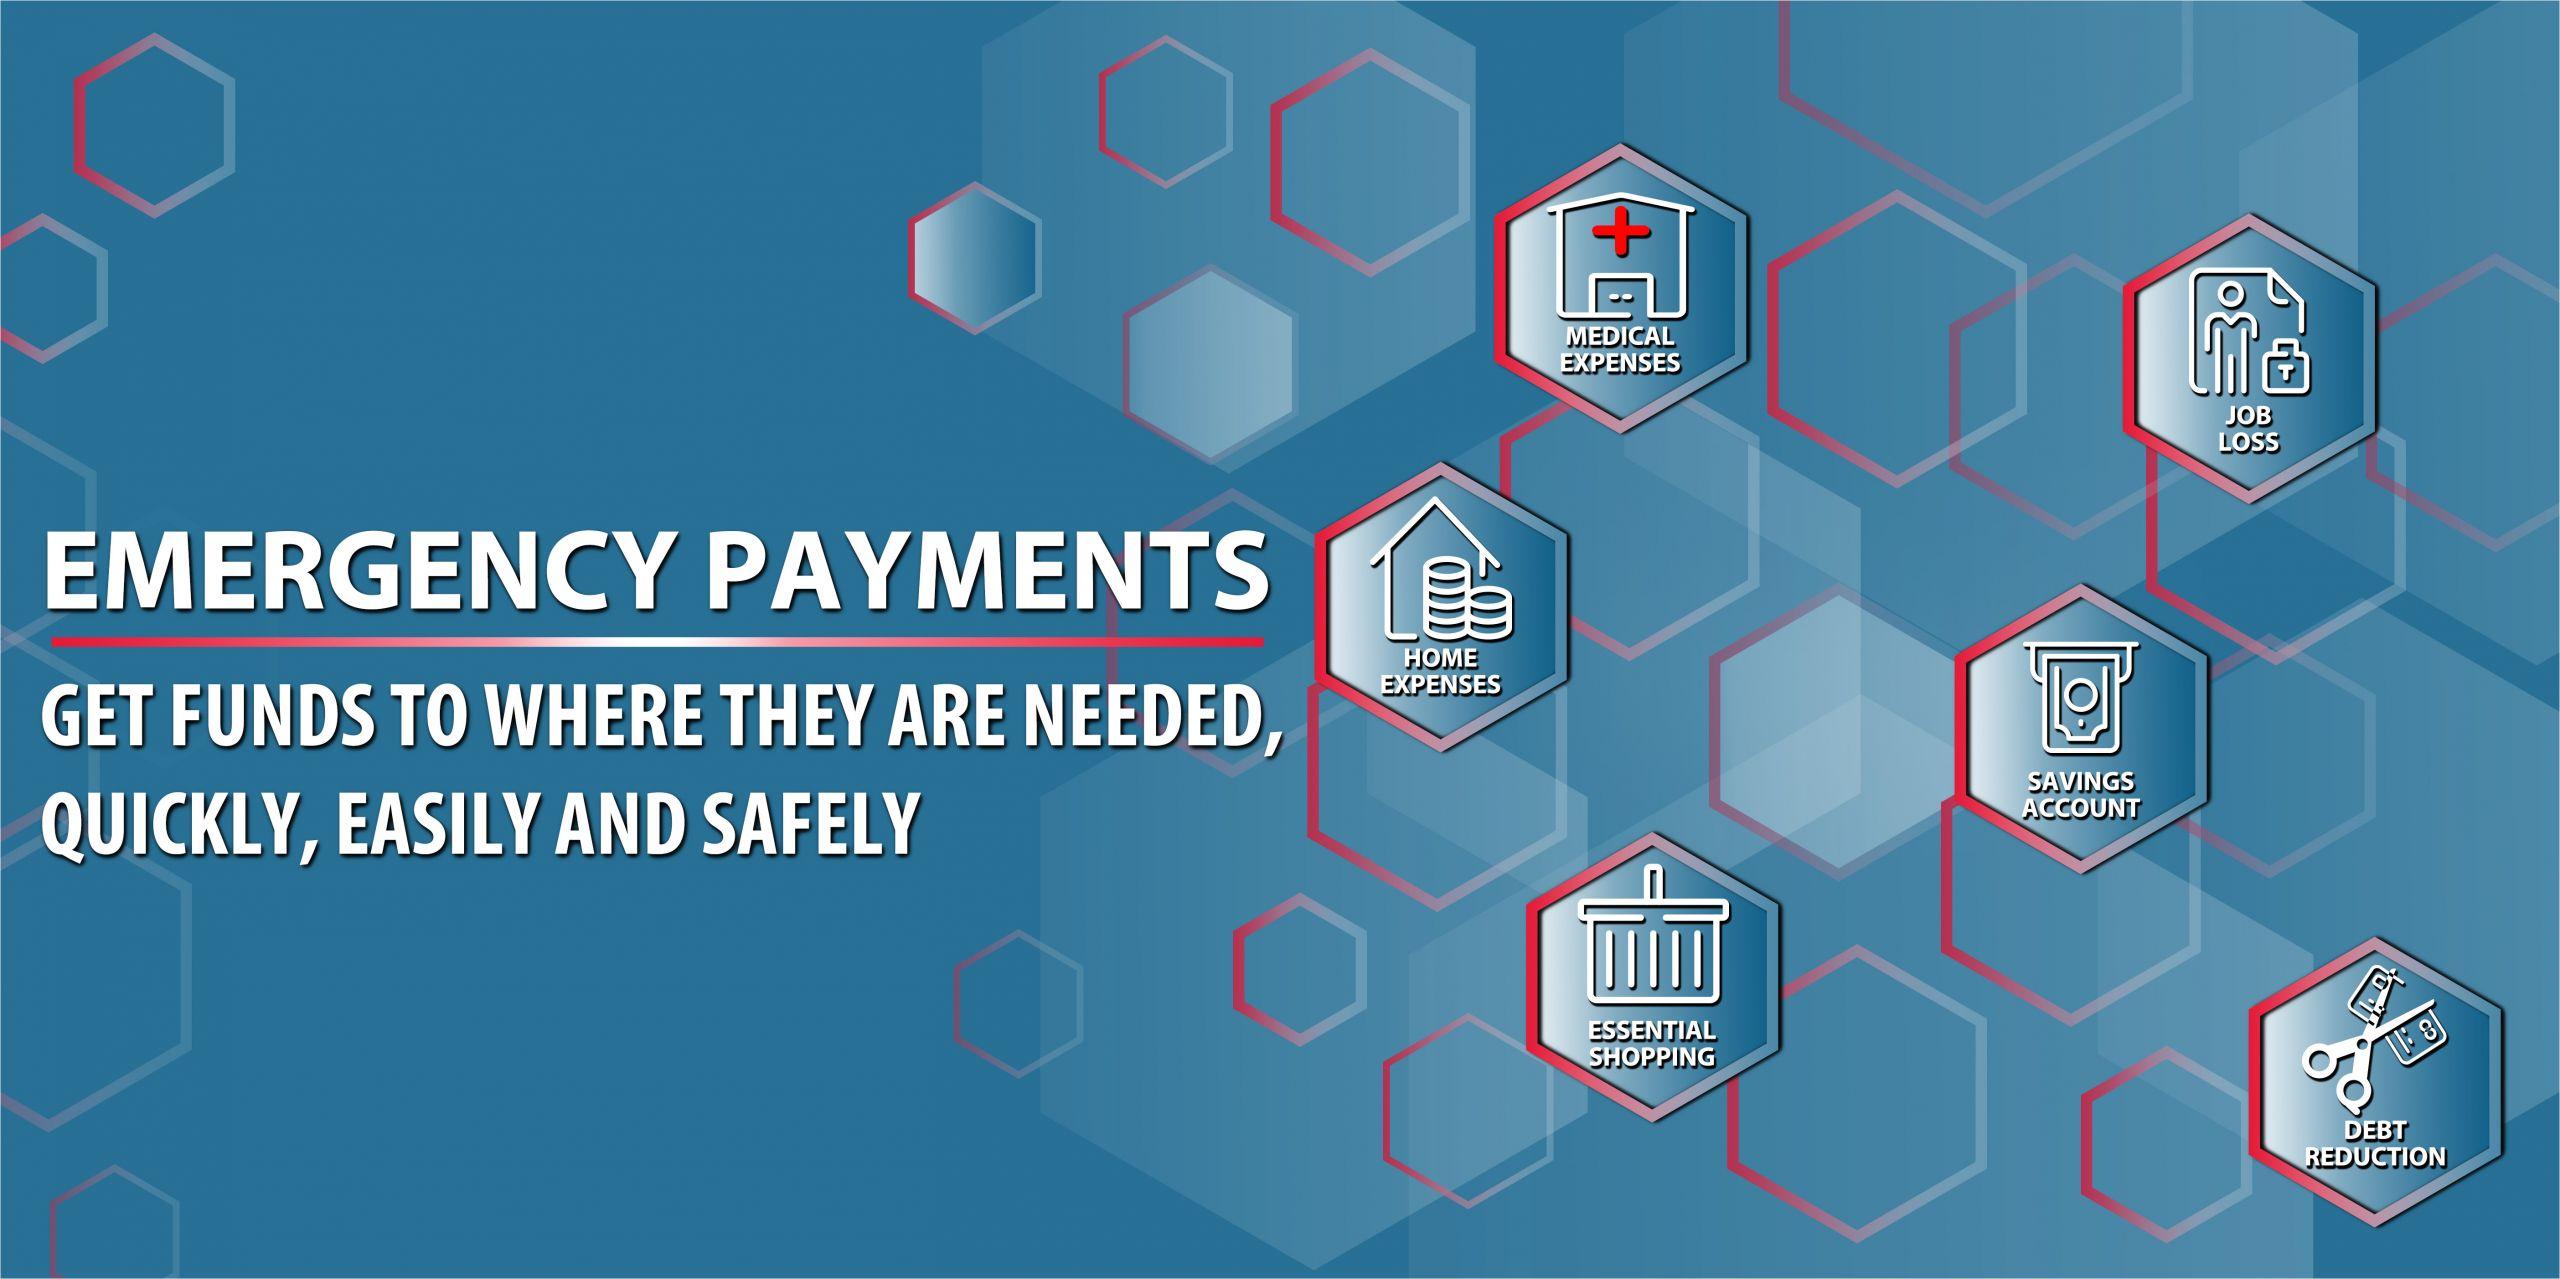 emergency paymentsslider jpg